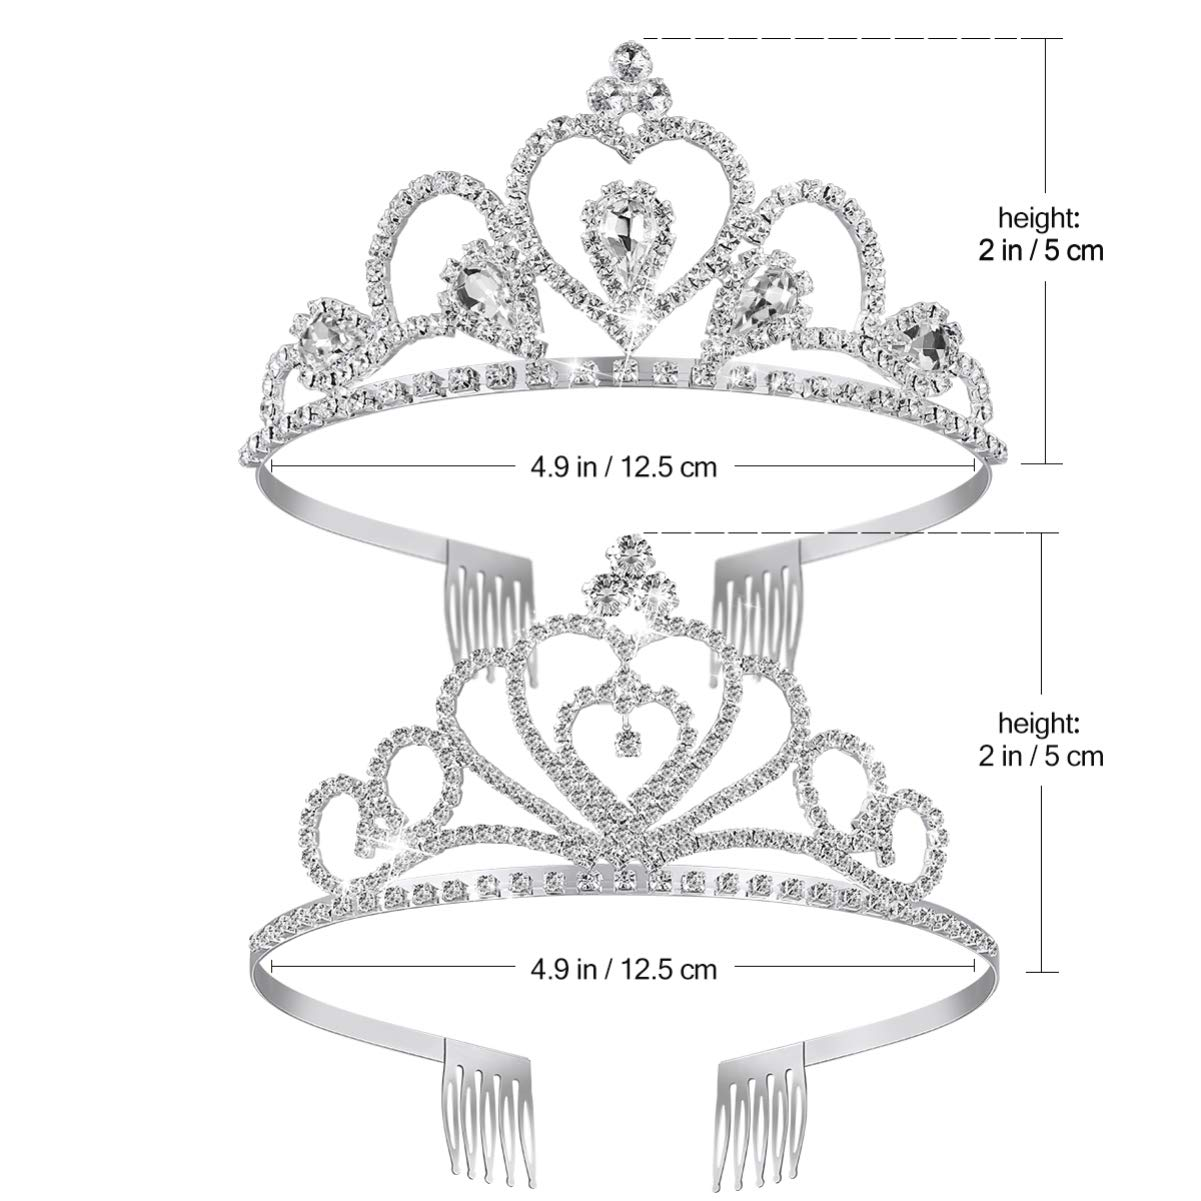 Bridal Crown Headband, Crystal Tiara Wedding Bridal Birthday Pageant Princess Tiara Crown Headband, 2 Pack